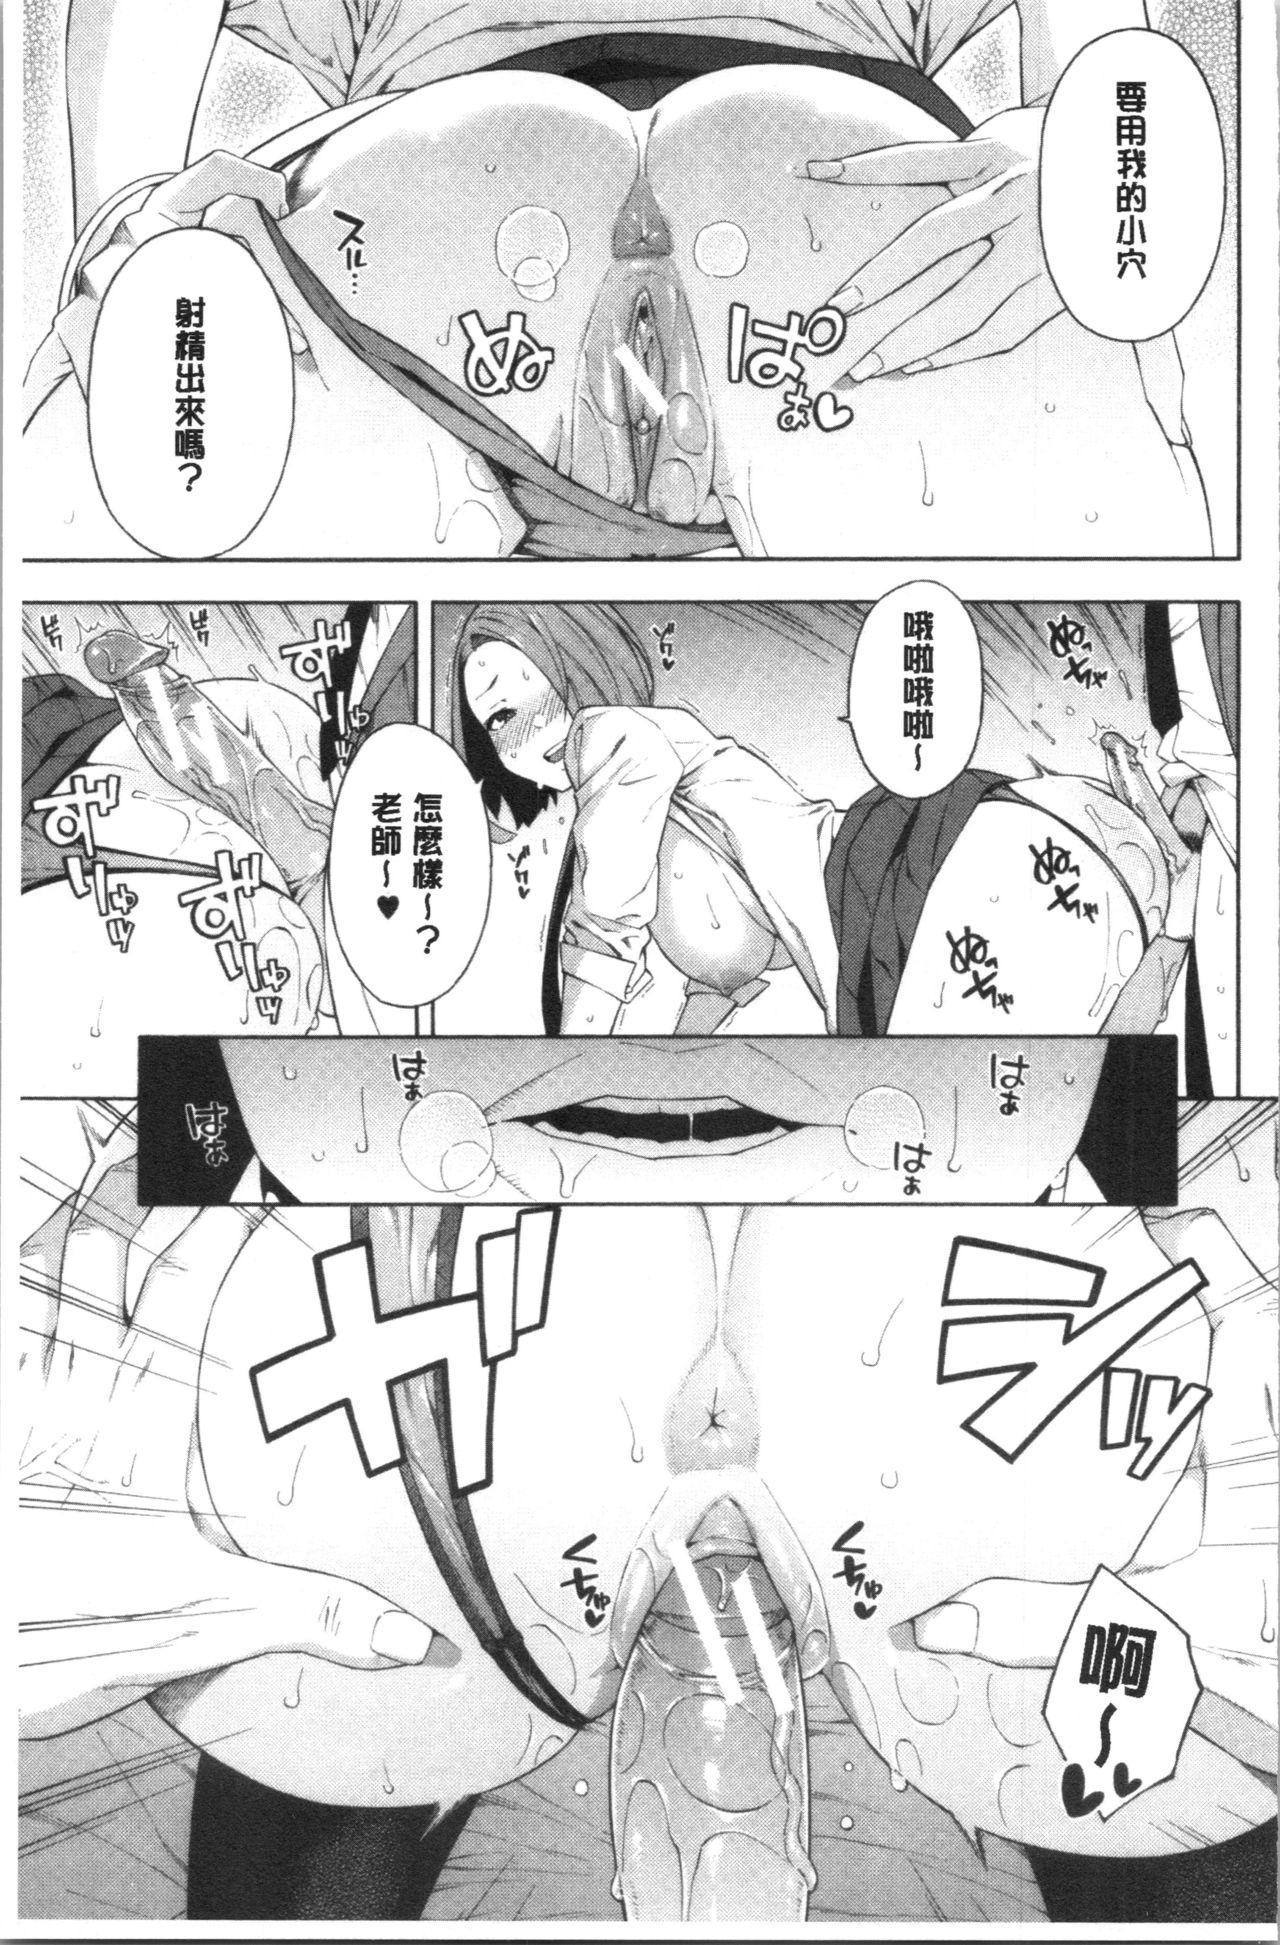 Okashite Ageru | 讓你來侵犯我 33